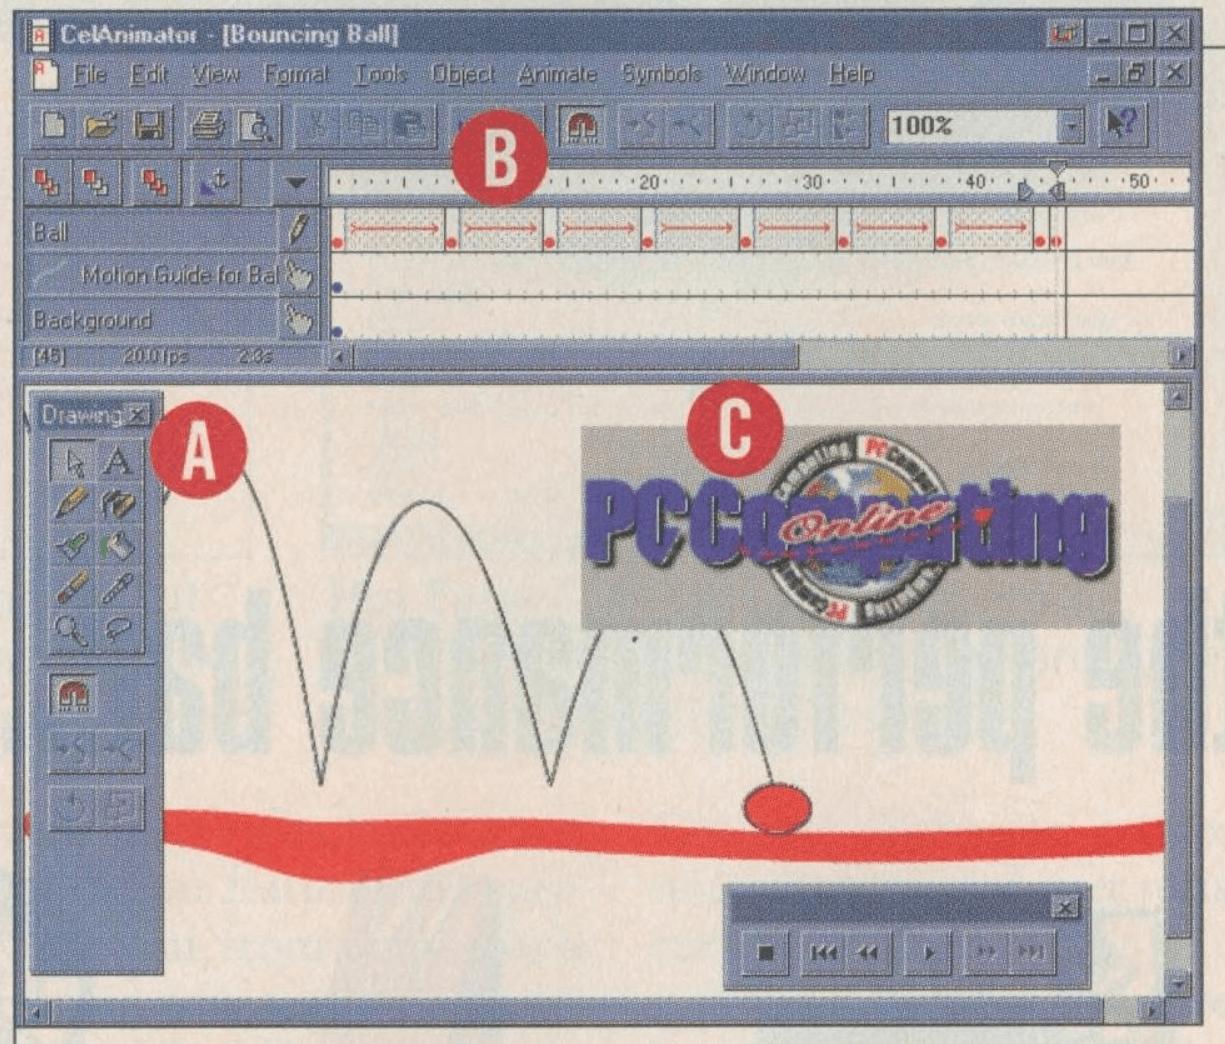 PC Computing Magazine Volume 9 Issue 9 / archive.org